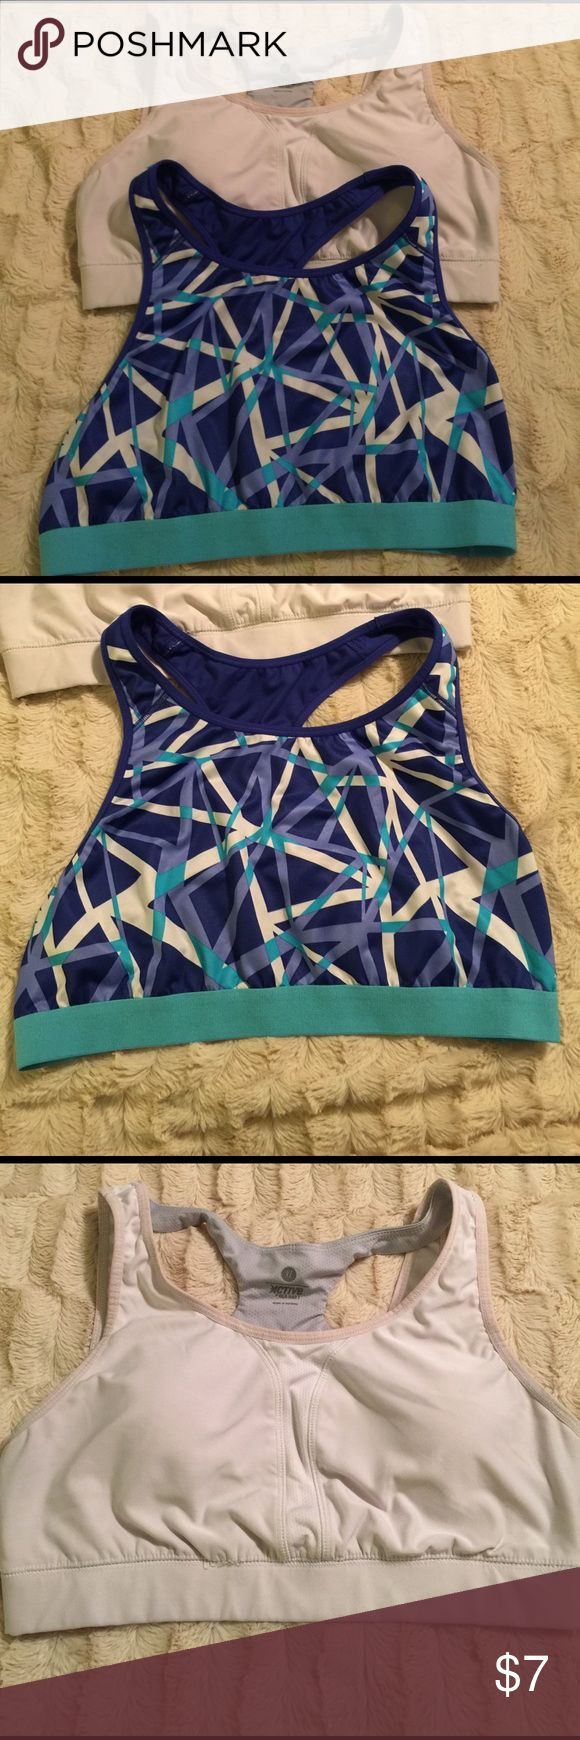 2 XL Old Navy sports bras 2 XL Old Navy sports bras Old Navy Intimates & Sleepwear Bras